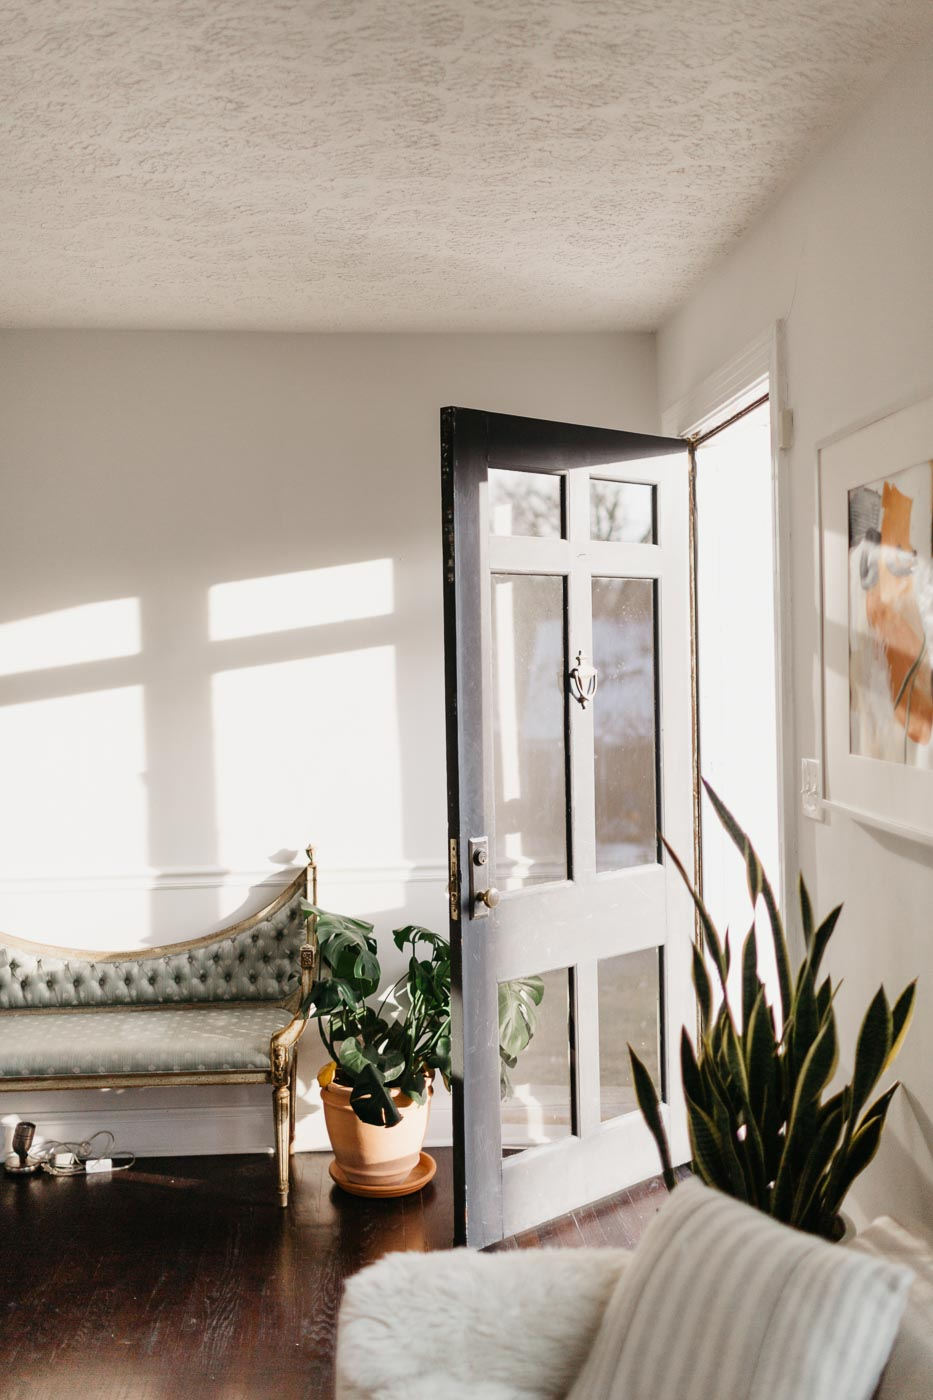 cozy-casa-nashville-tn-natural-light-studio-photography-ideas-lifestyle-photographer-photography-25.jpg